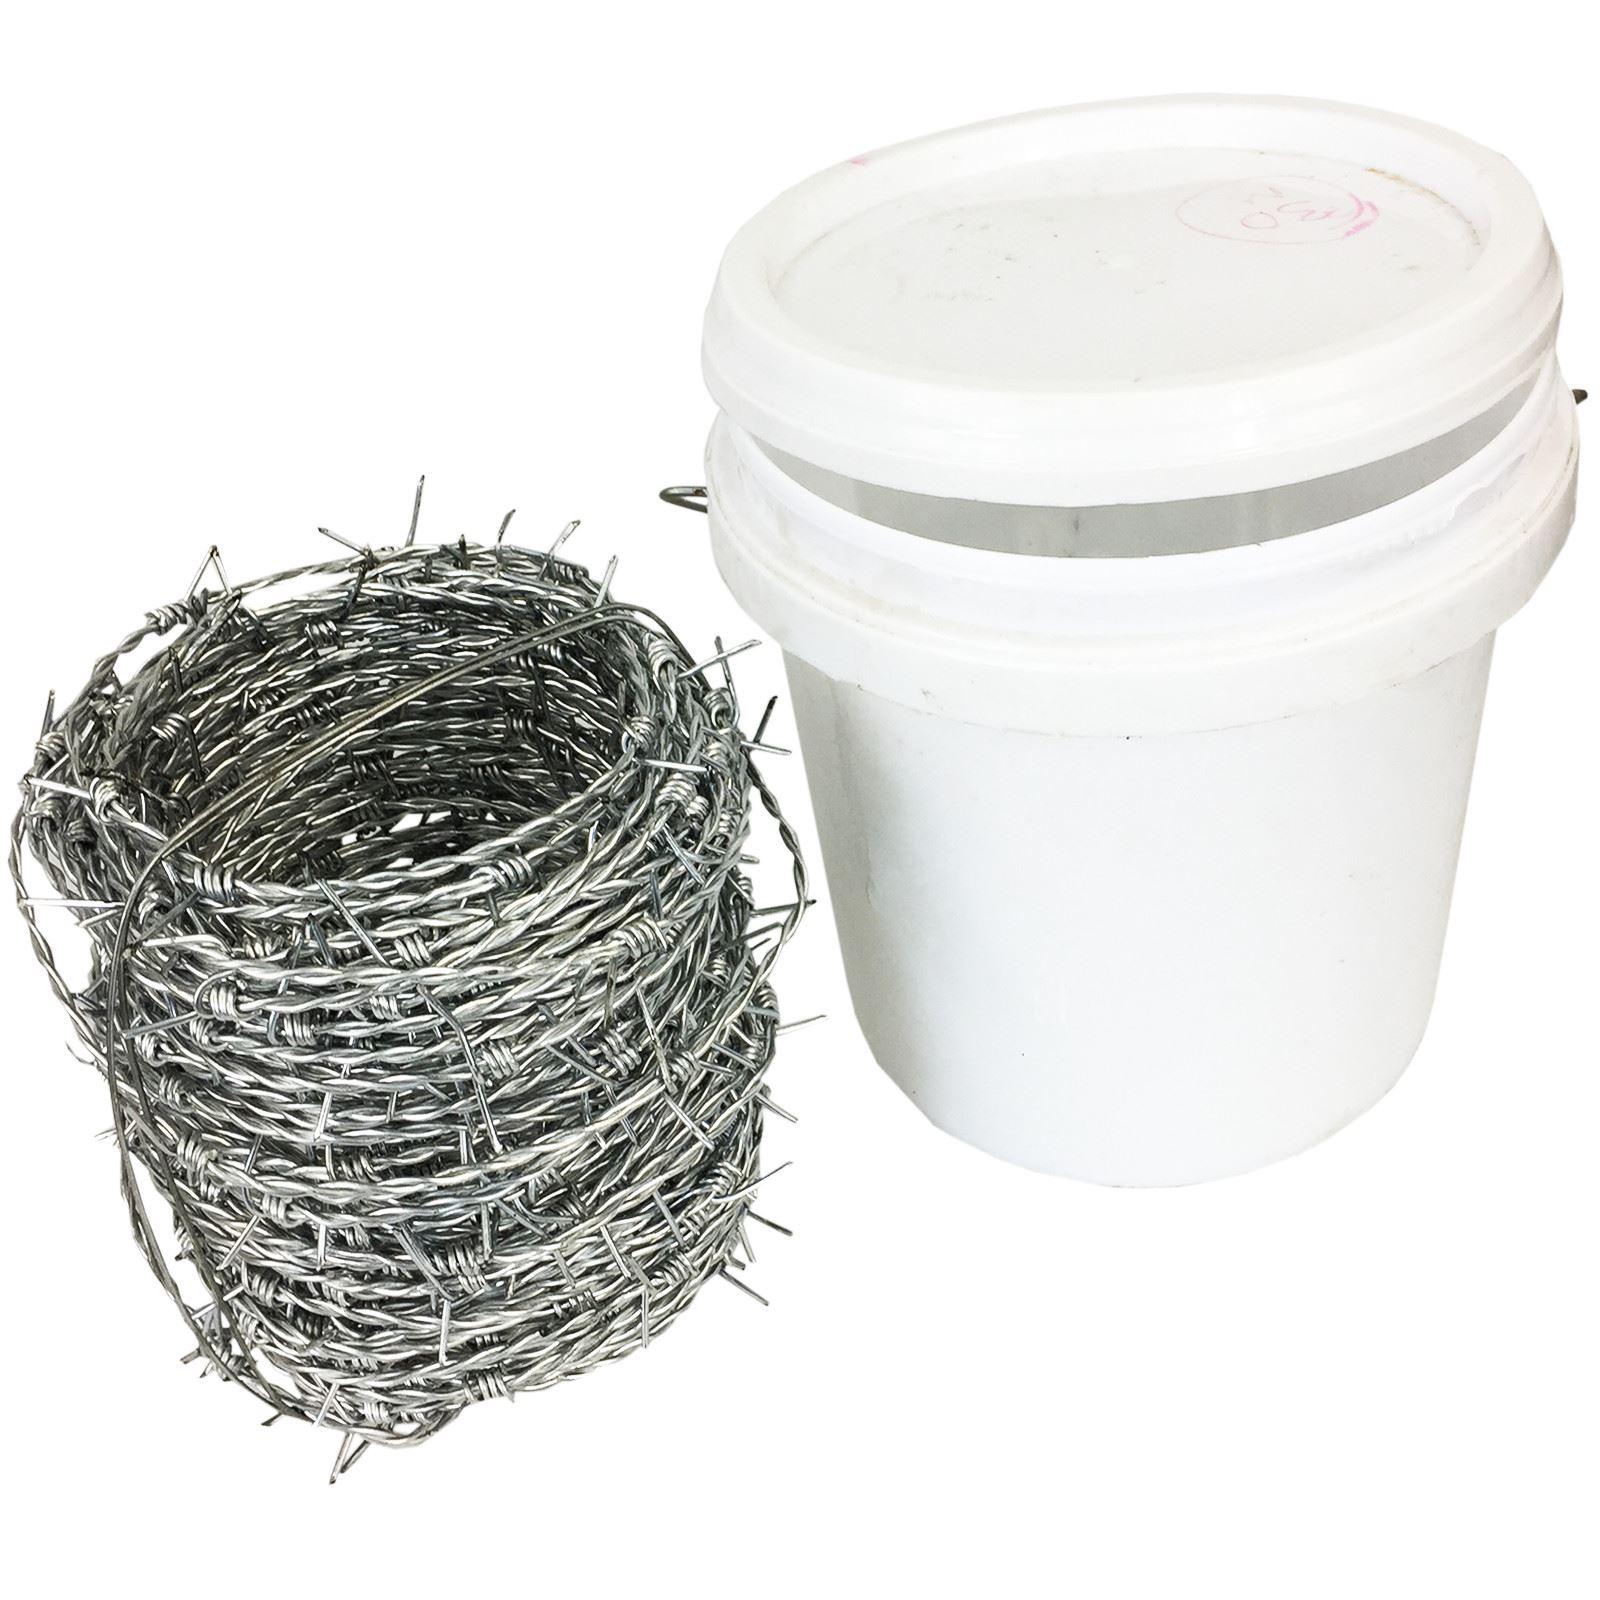 Fantastic 4 0 Urd Wire Image - Wiring Diagram Ideas - guapodugh.com